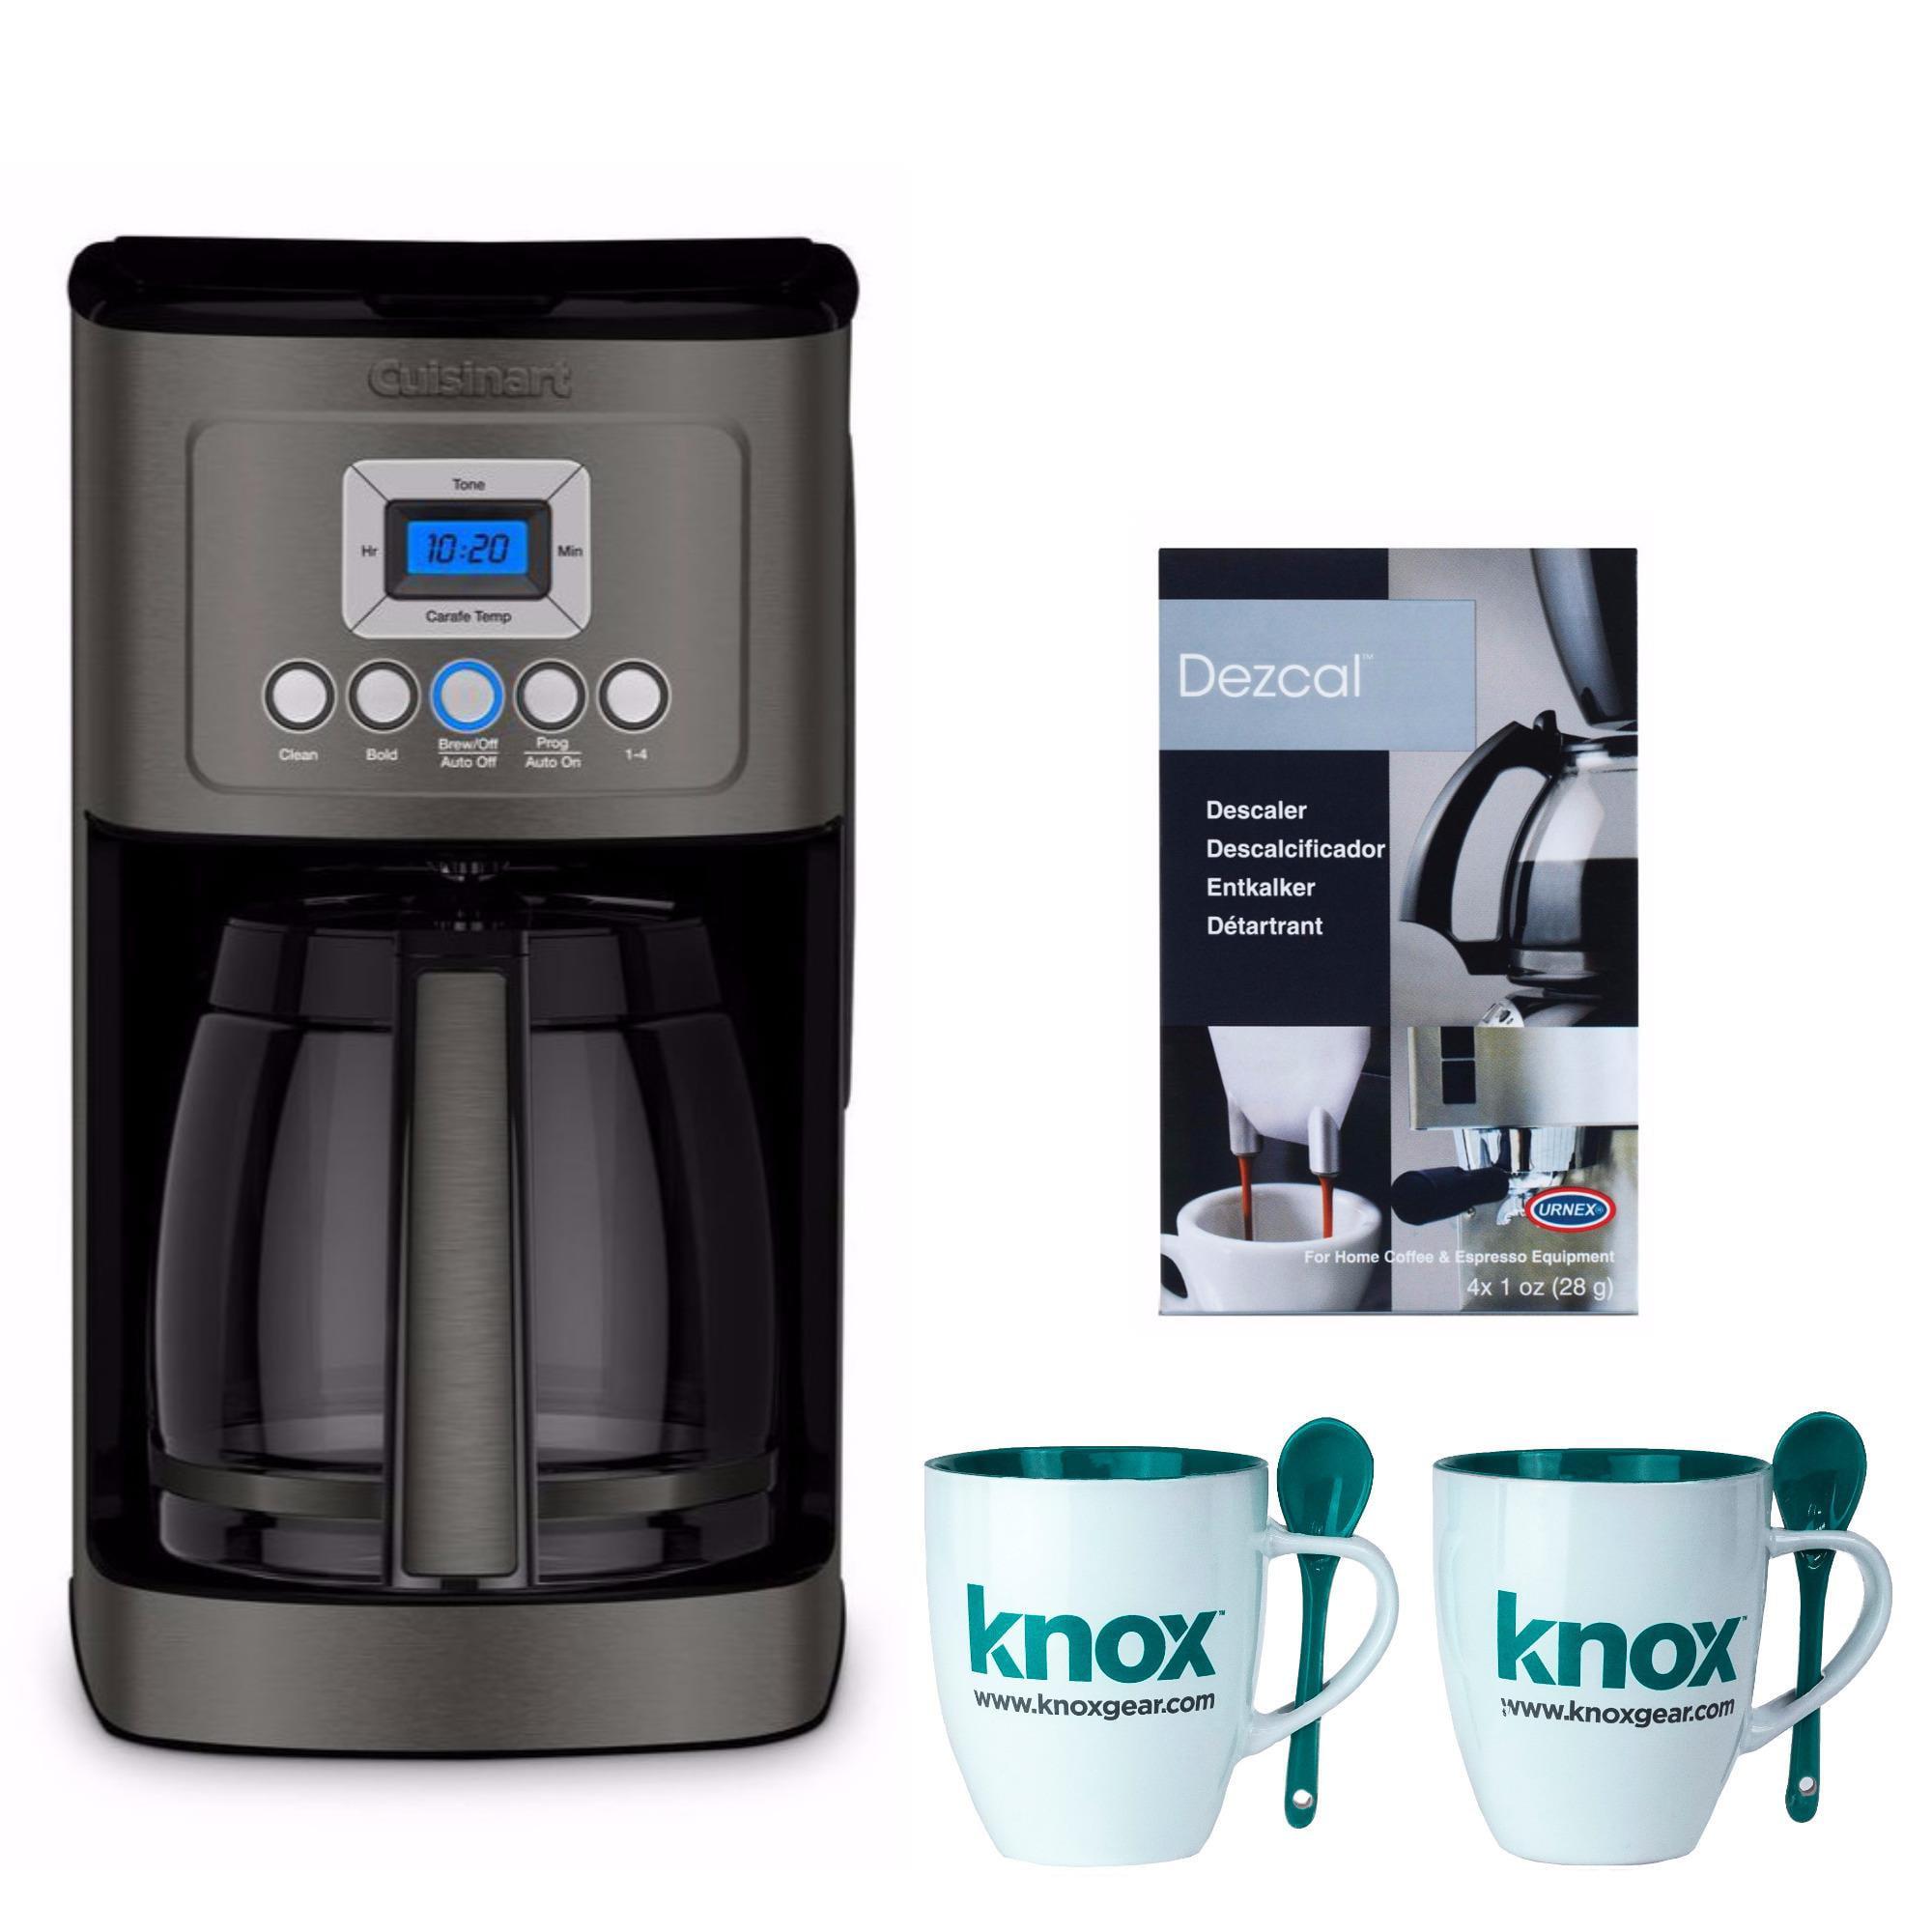 Cuisinart DCC-3200BKS Perfectemp Coffee Maker (Certified Refurbished Bundle)